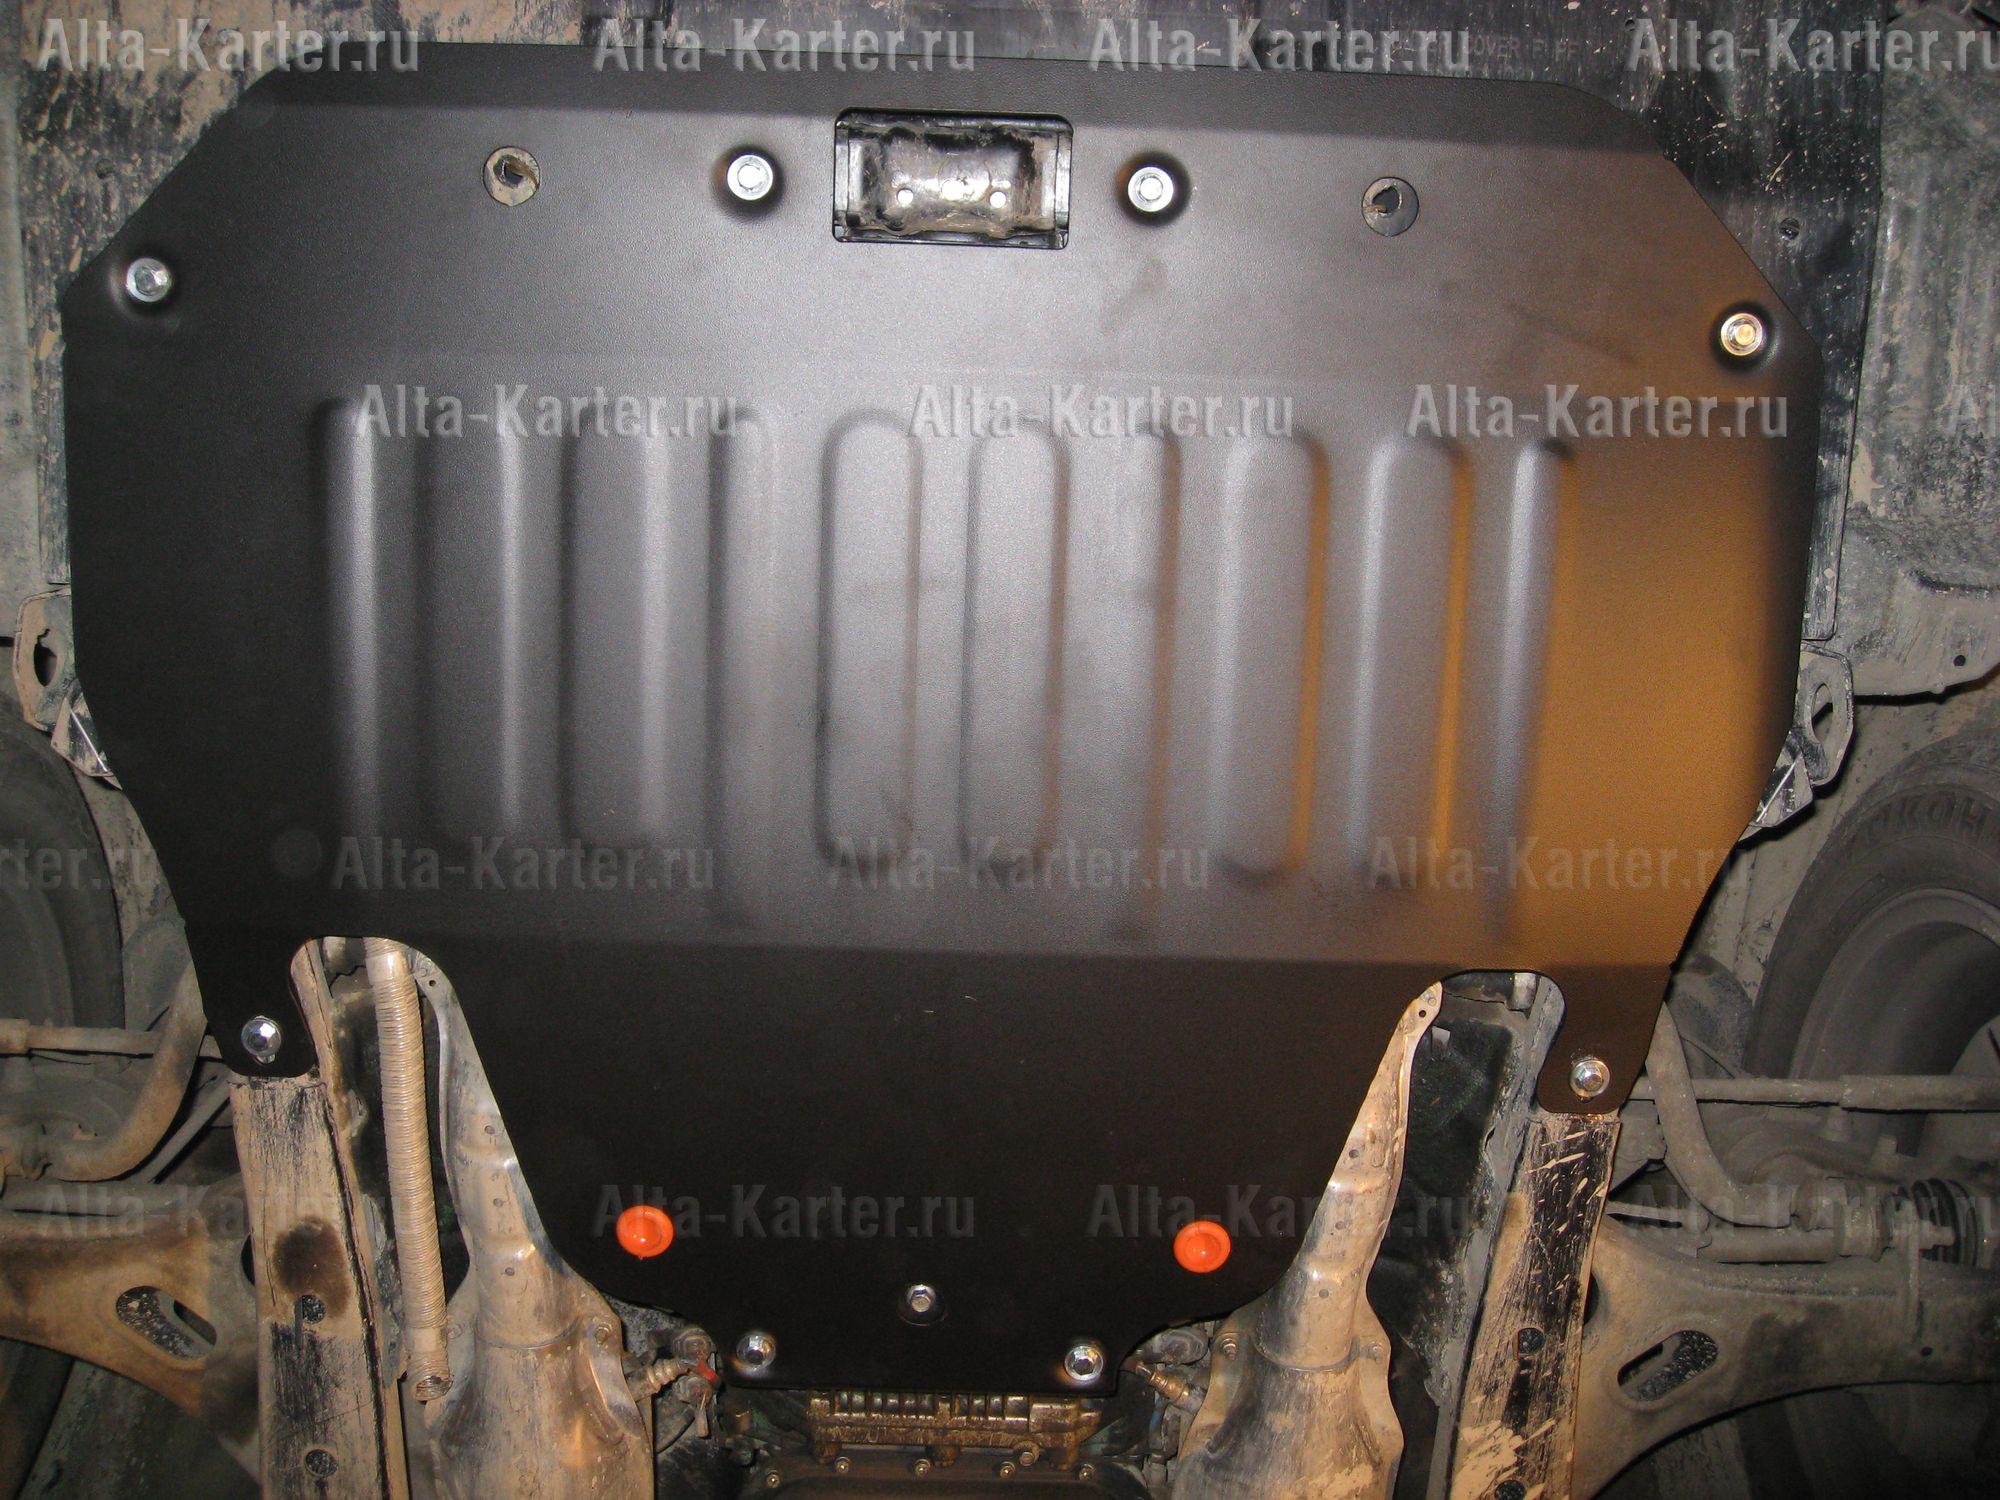 Защита Alfeco для картера Subaru Outback IV 2009-2014. Артикул ALF.22.05